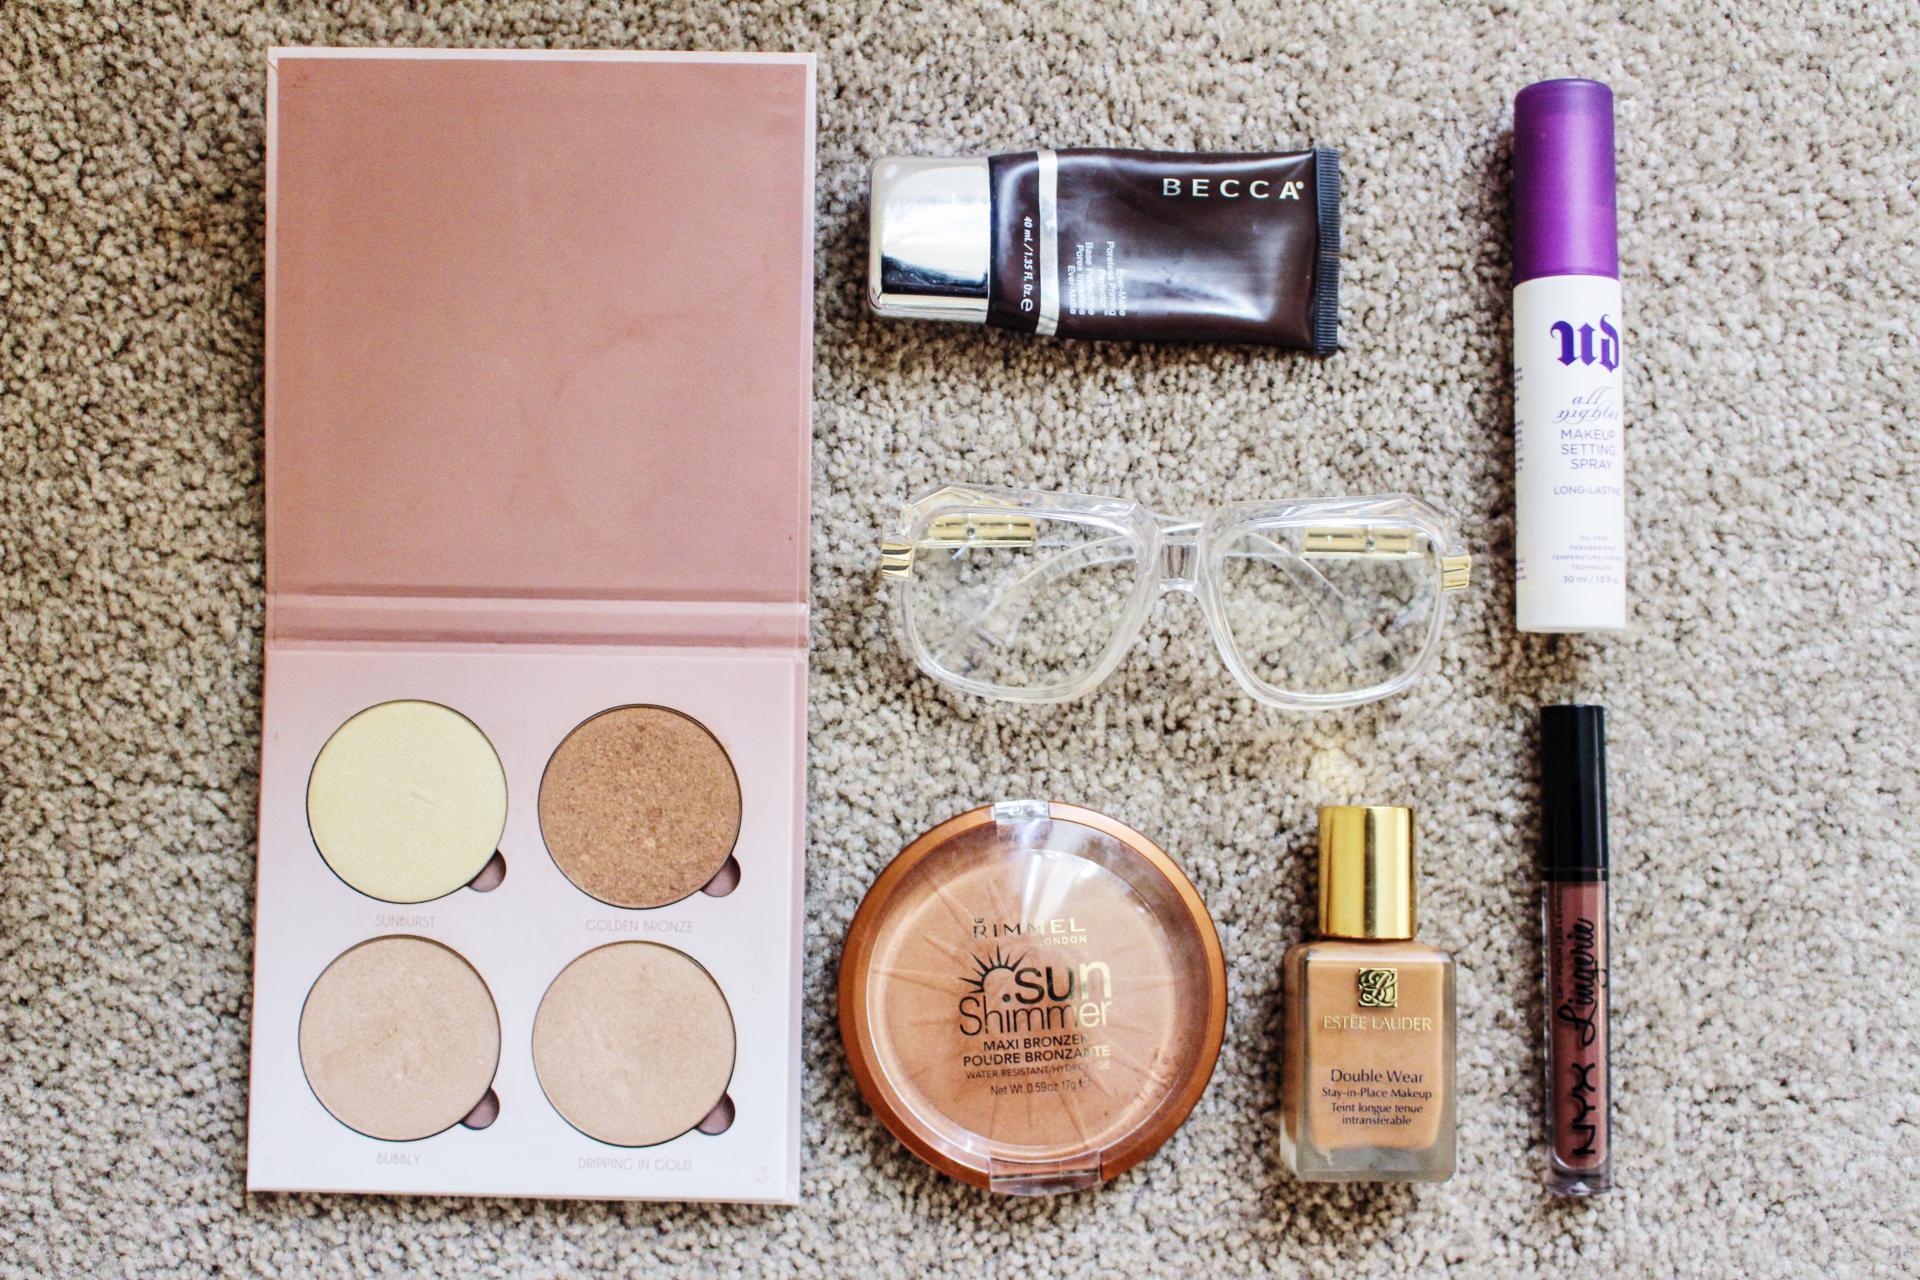 Makeup/The Lotus Pure